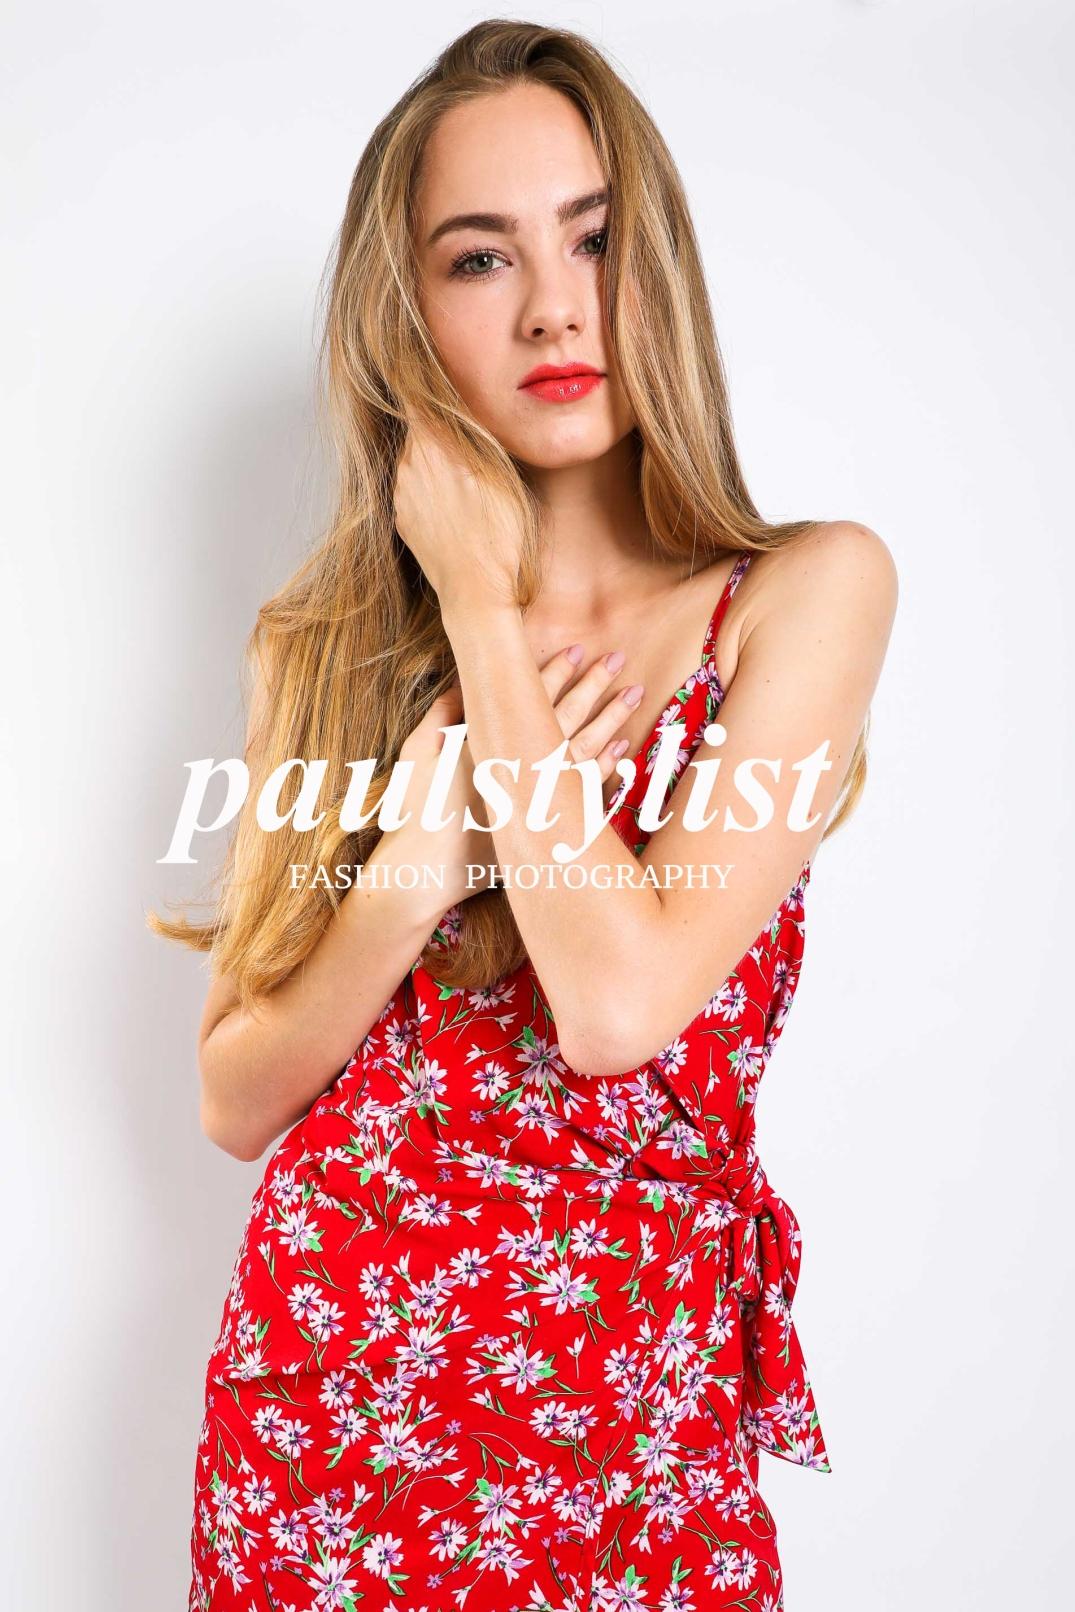 fashion_shooting_lingerie_hongkong_makeup_hairstyling_香港時裝攝影_paulstylist_photography_hk_model_kate-55b